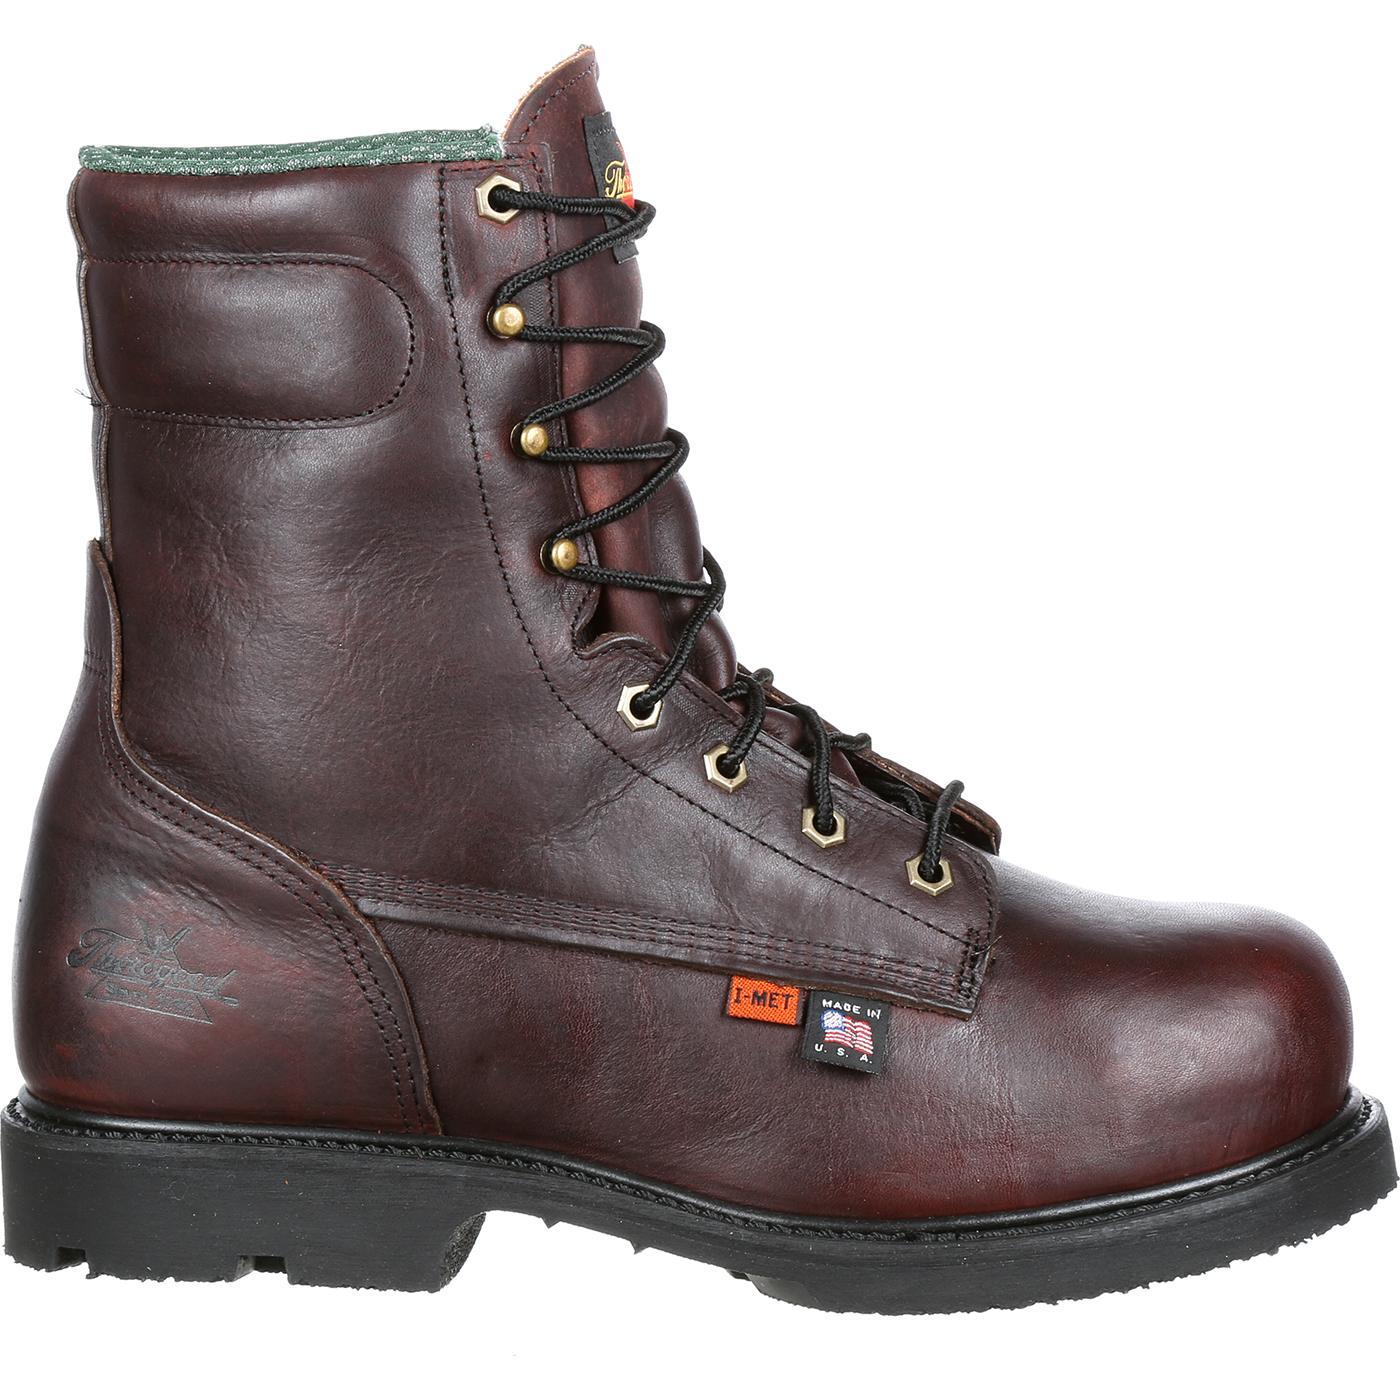 b6e62abd1b6 Thorogood I-MET2 Steel Toe Internal Metatarsal Guard Work Boot